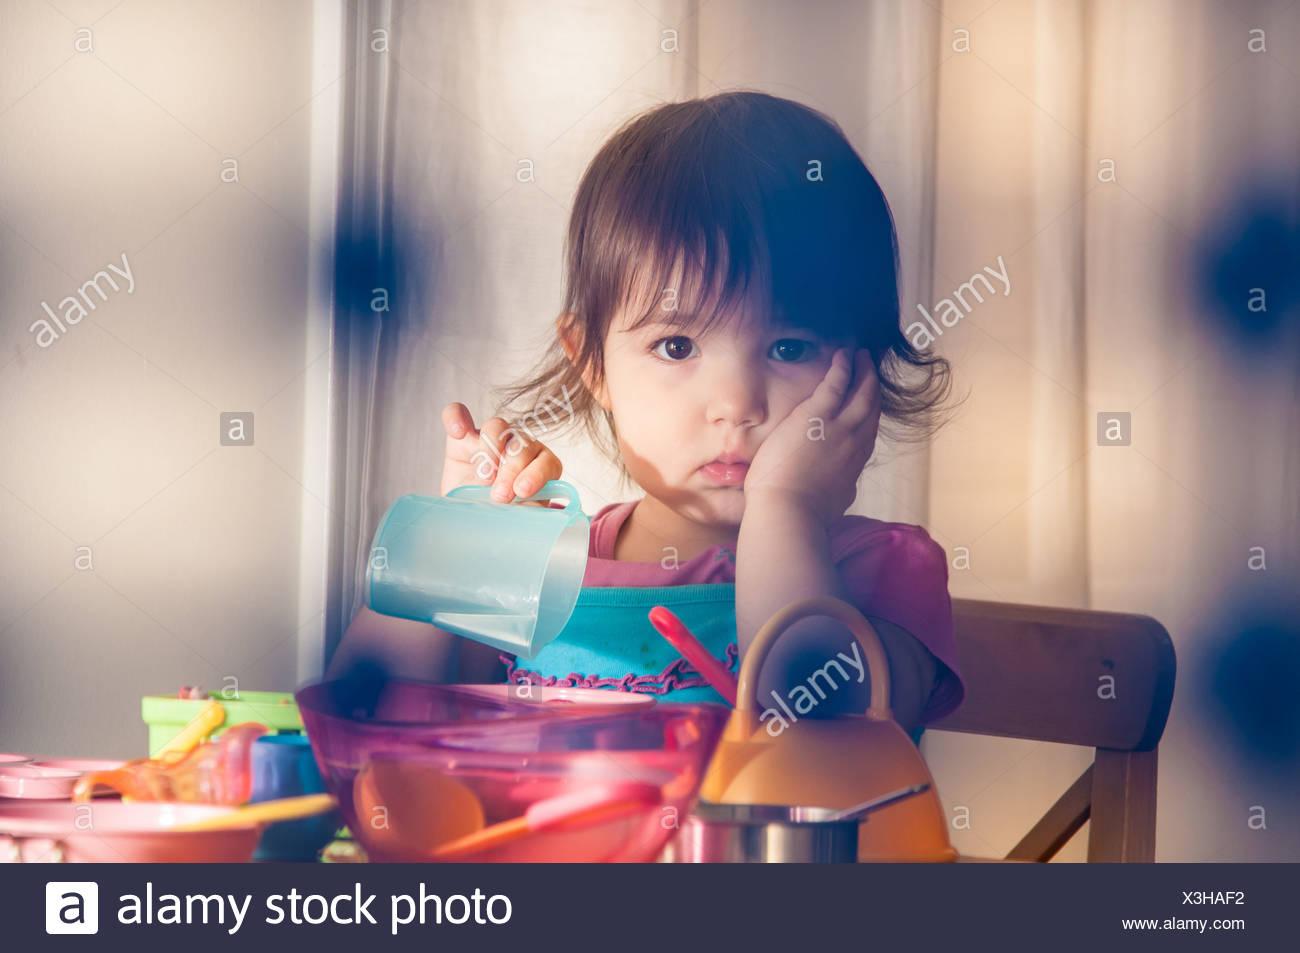 Triste niña jugando con juguetes Imagen De Stock